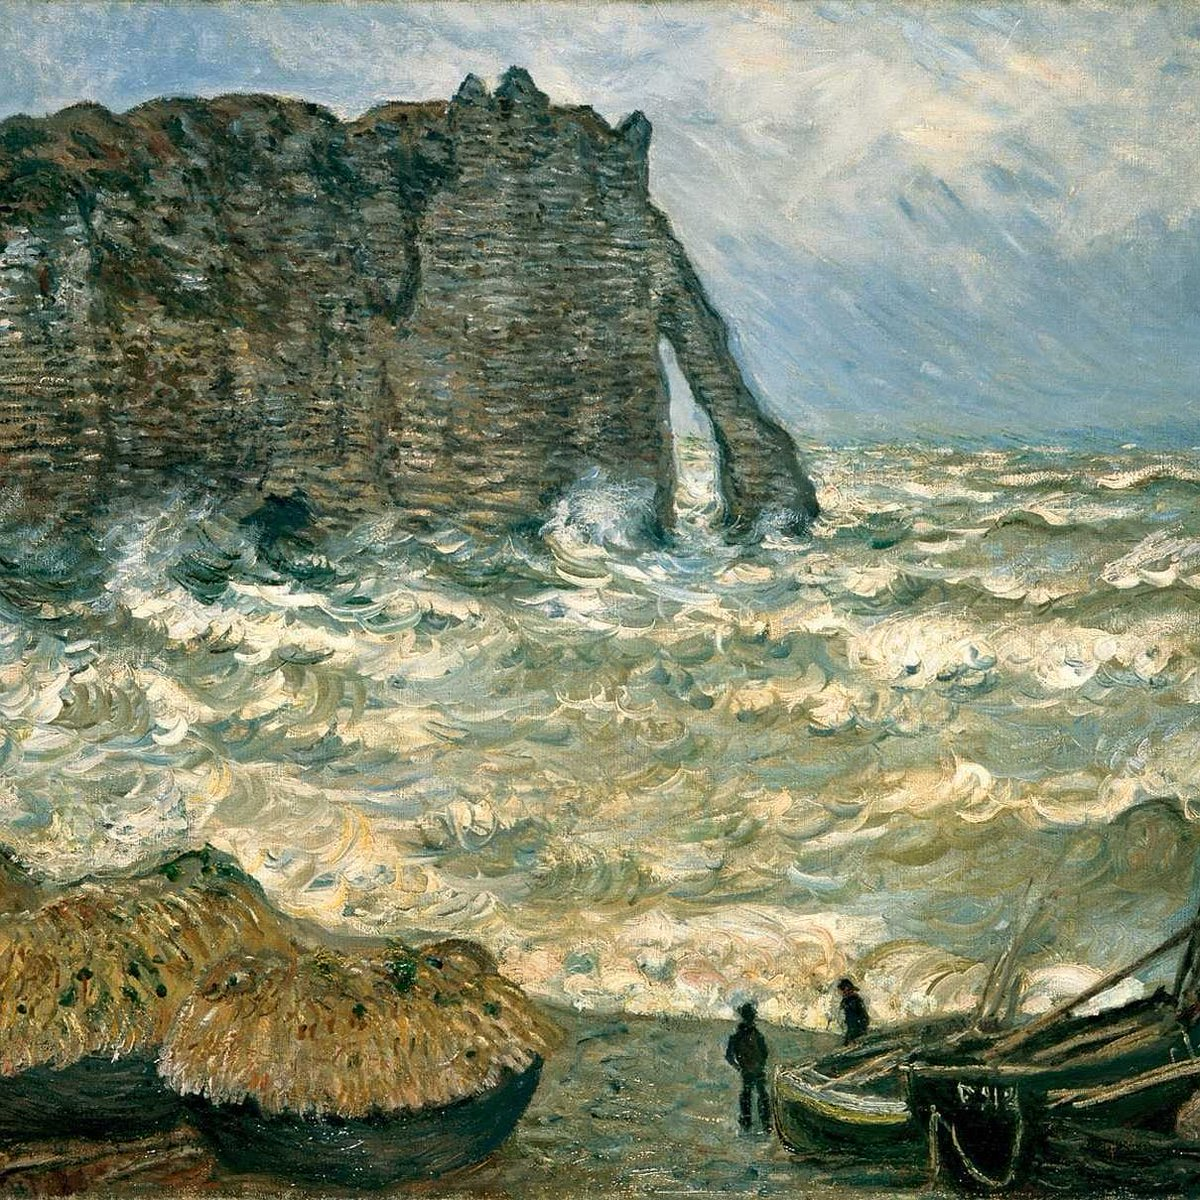 скалы и море < Этрета, бурное море >:: Клод Моне, описание картины - Claude Monet фото